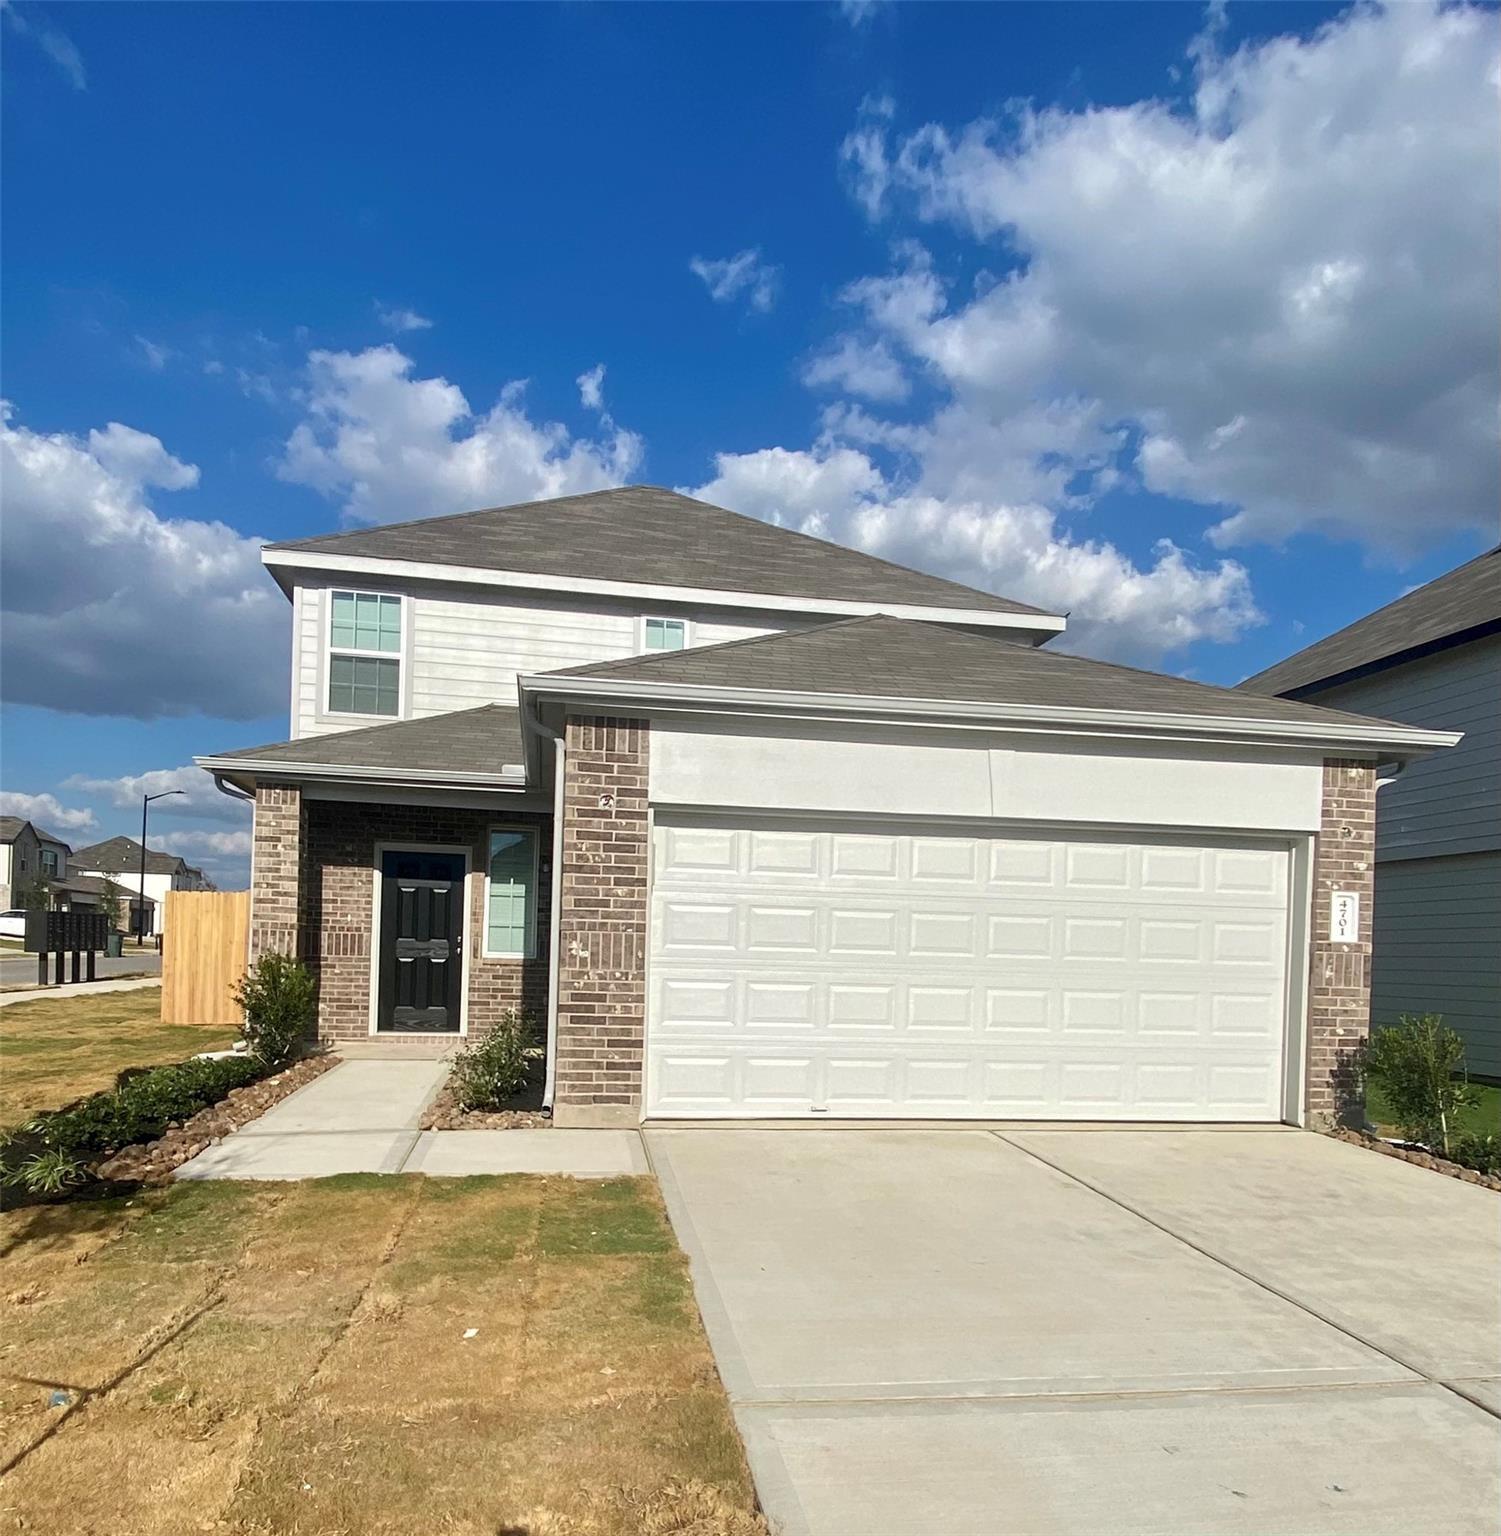 4701 Los Pines Way Property Photo - Bryan, TX real estate listing